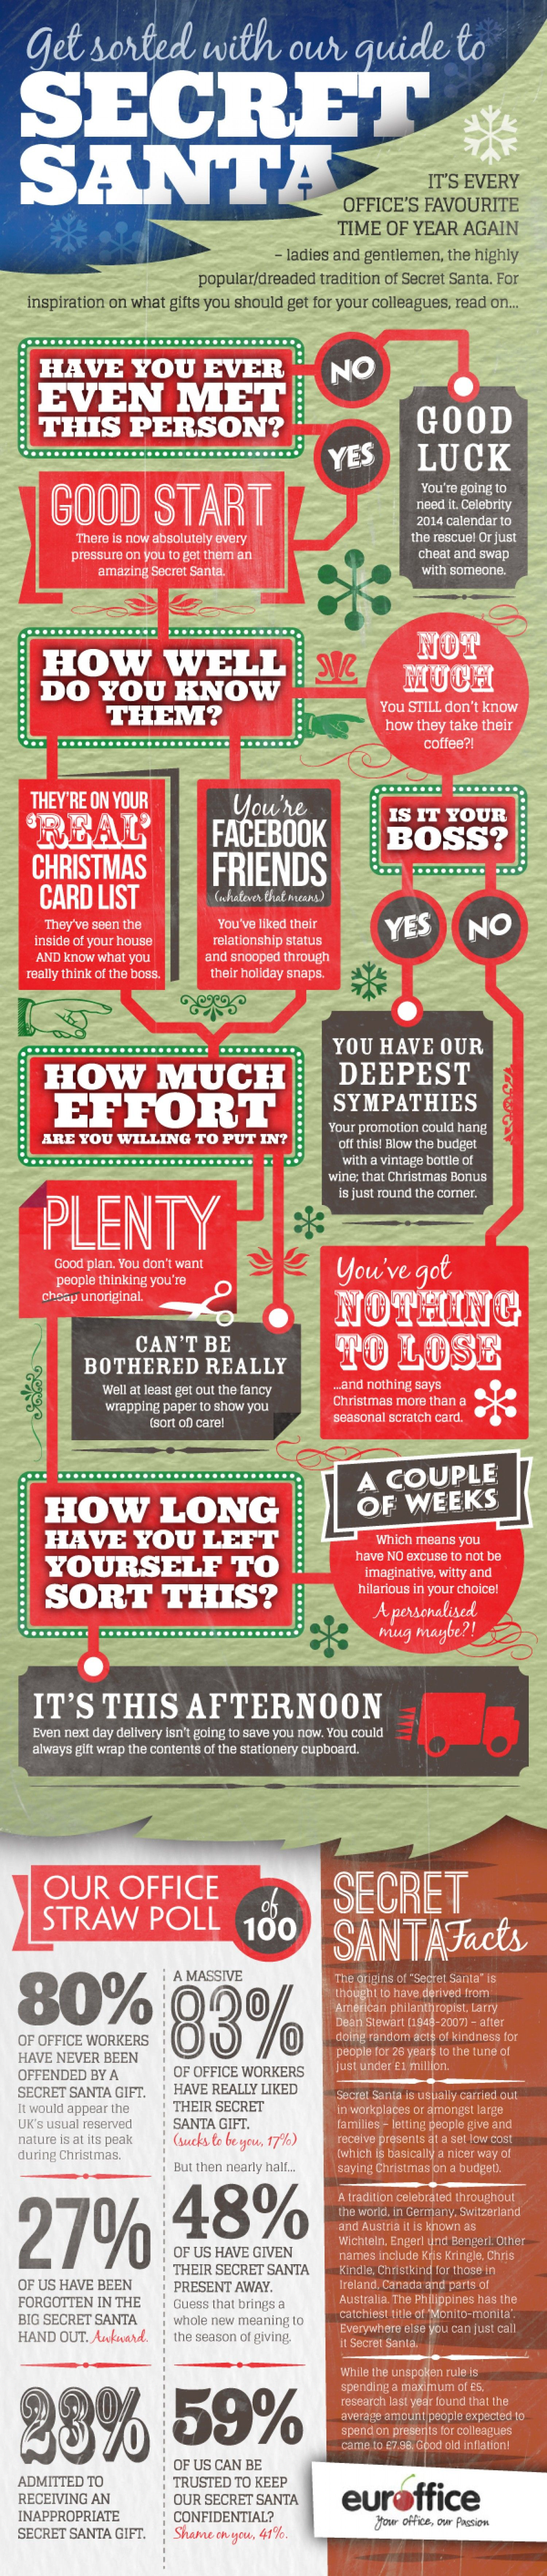 Guide to Buying Secret Santa Presents Infographic Secret